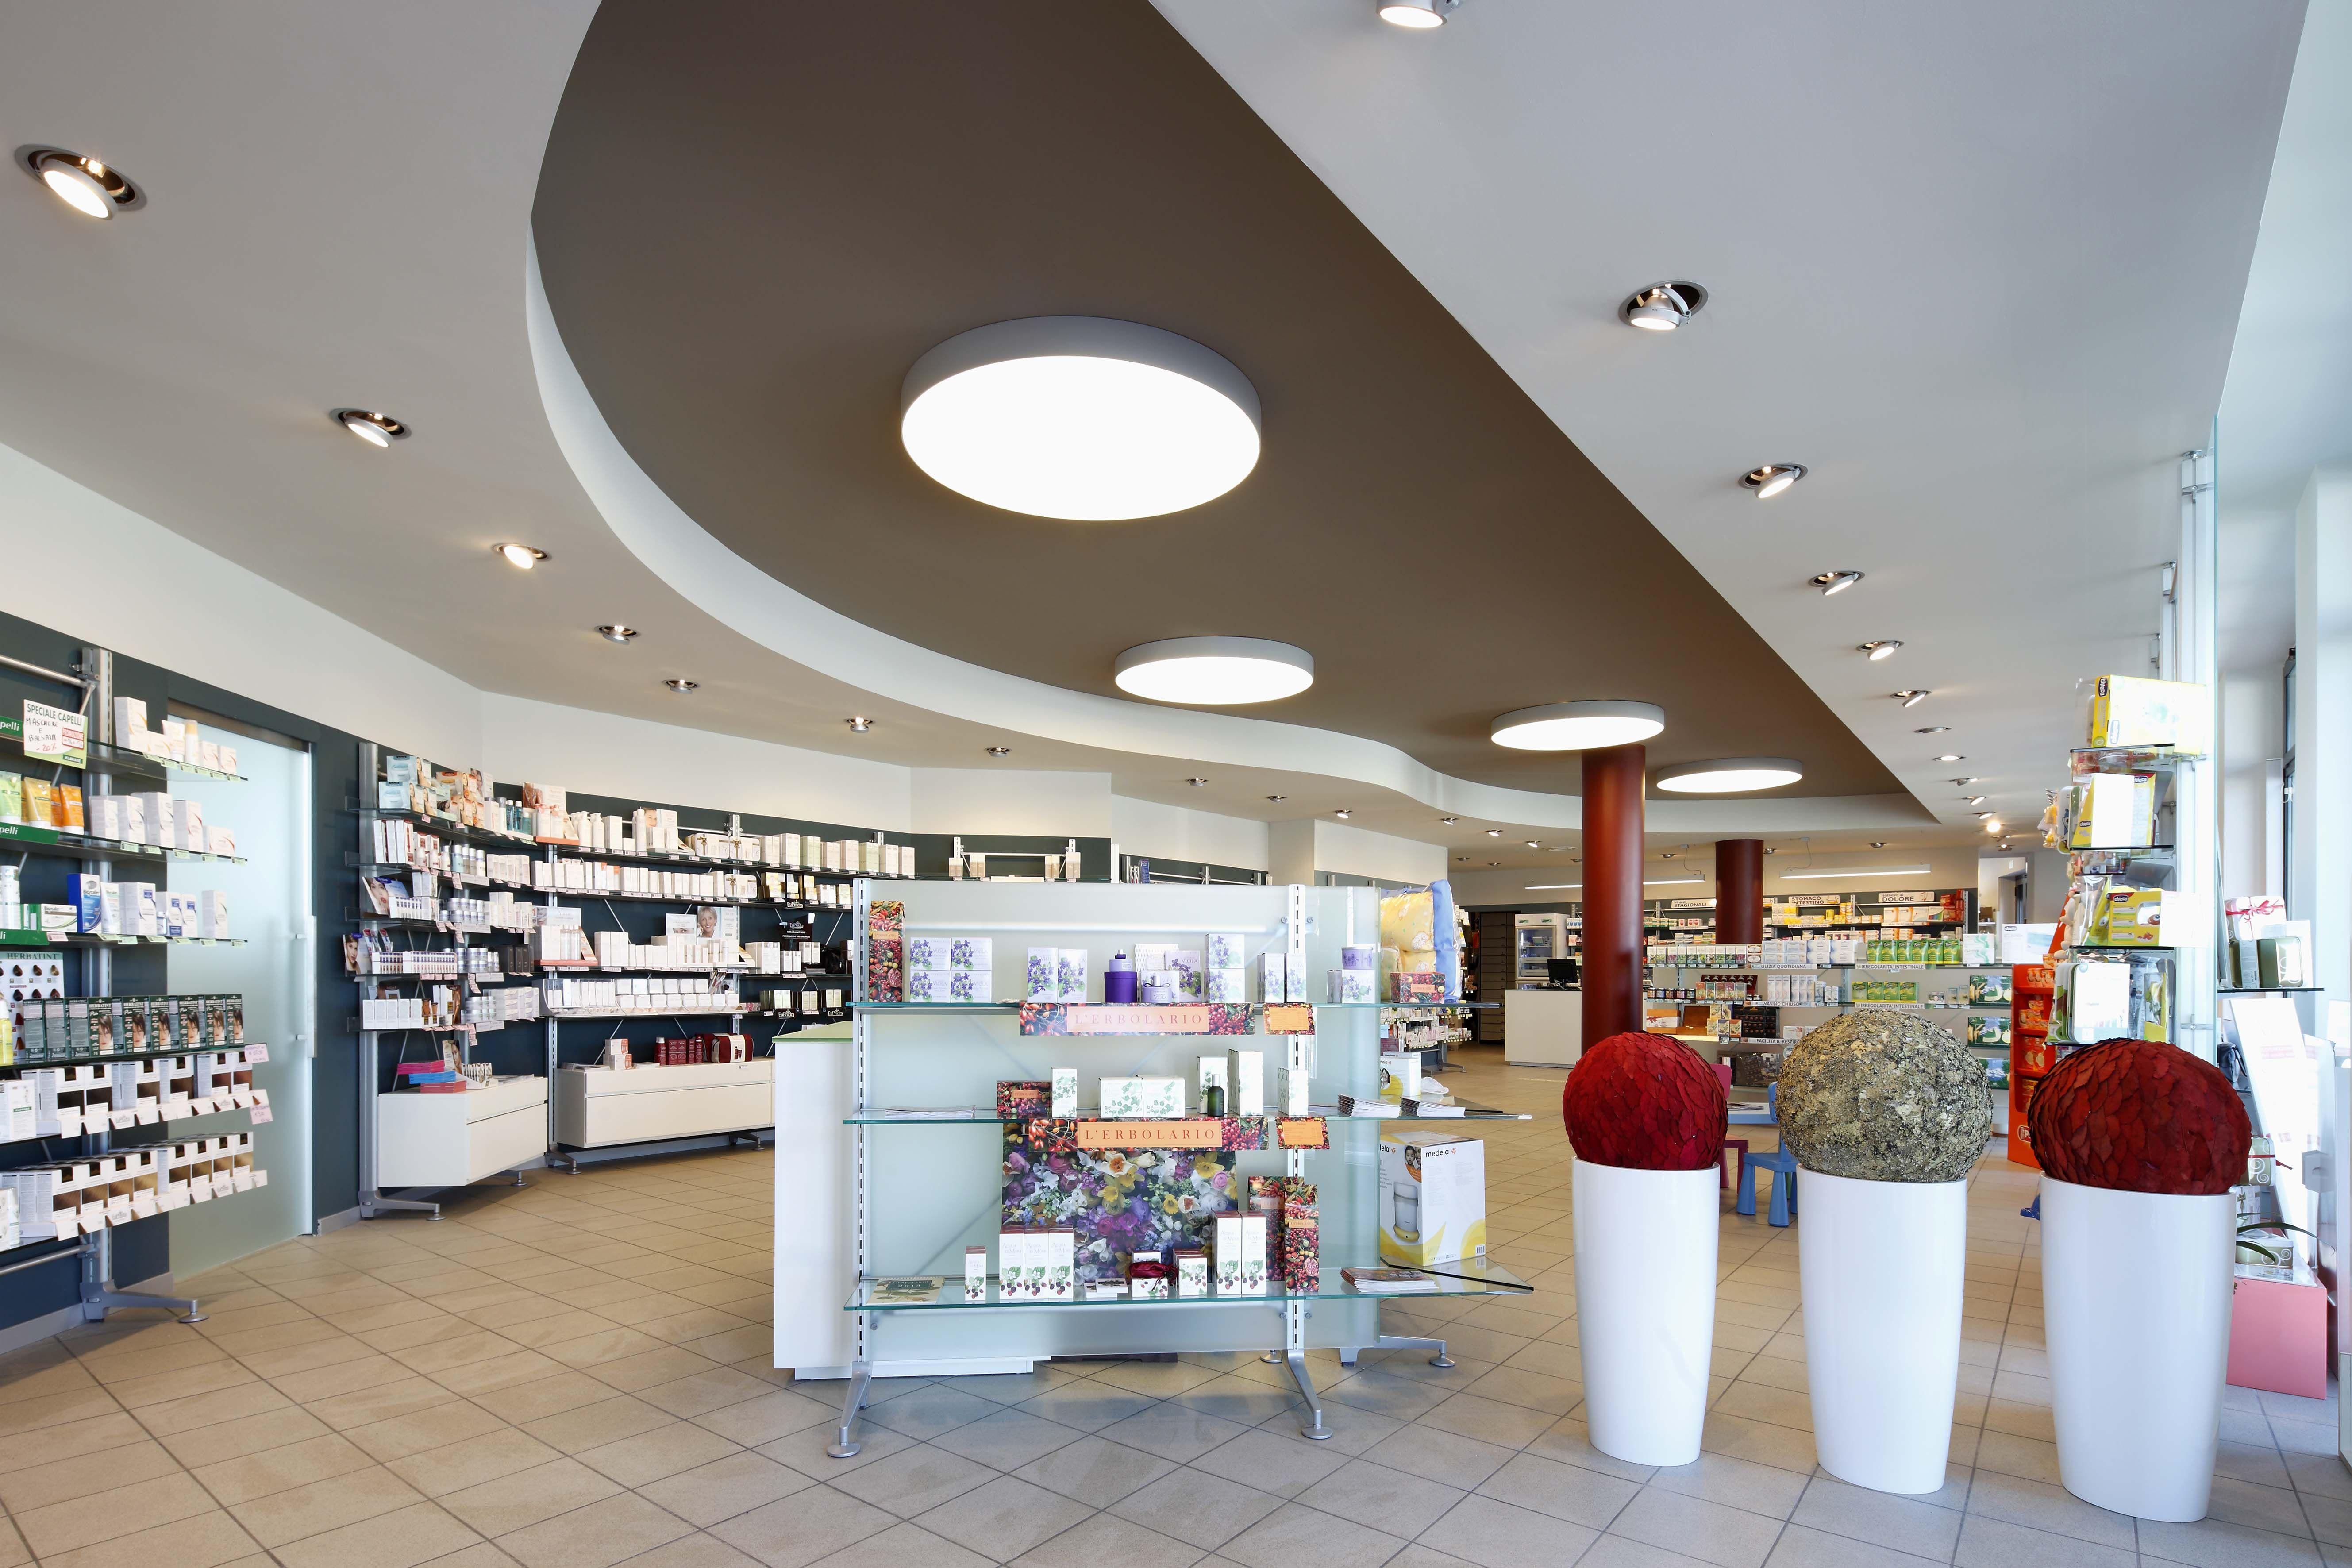 Pharmacy Coda Th Kohl Th Kohl Furnitures In Italy Pinterest # Kohl Muebles Farmacia